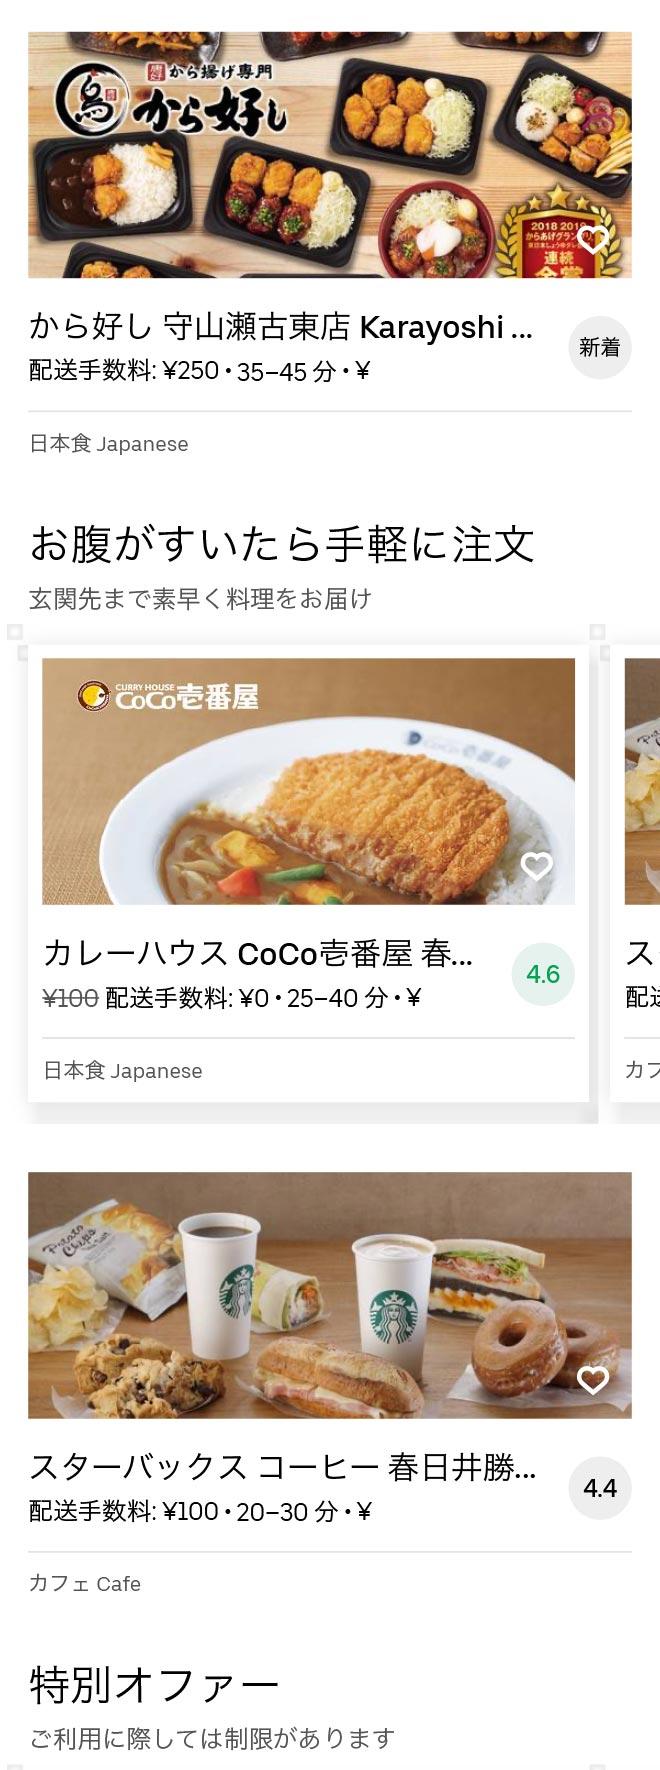 Kachigawa menu 2010 02